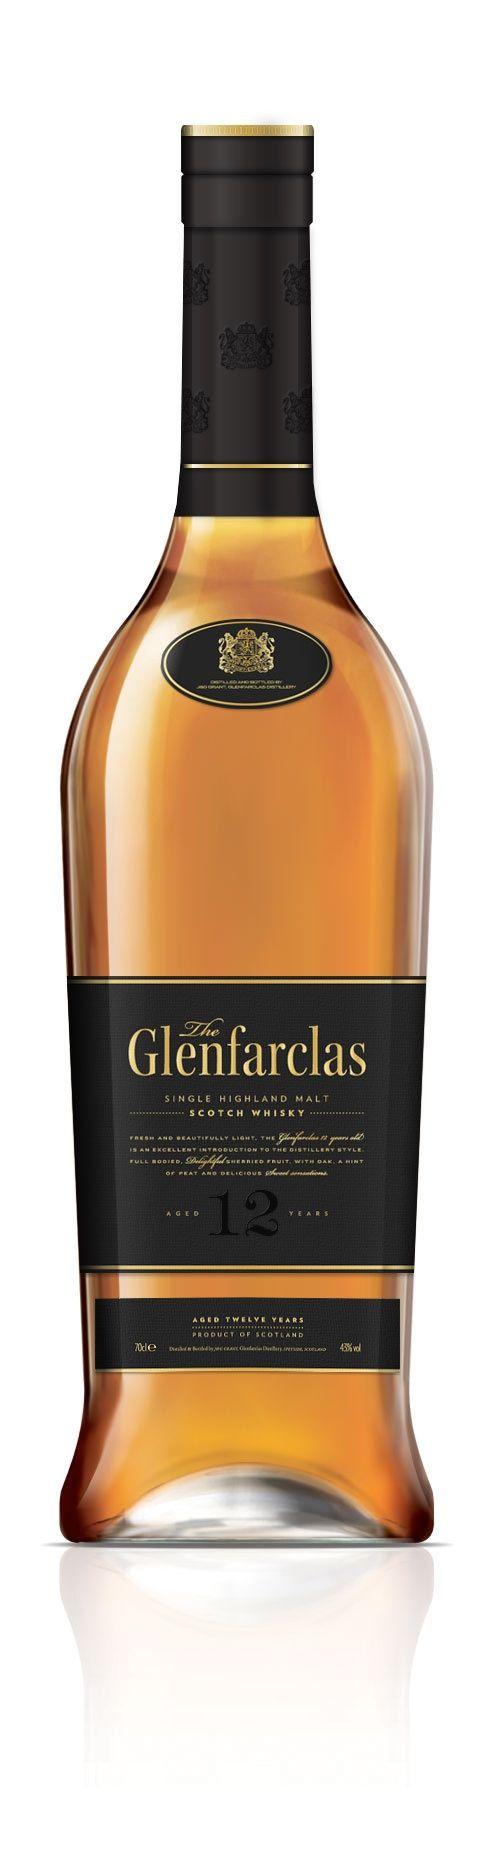 Glenfarclas 12 years old Scotch Whisky | #whiskey #whisky